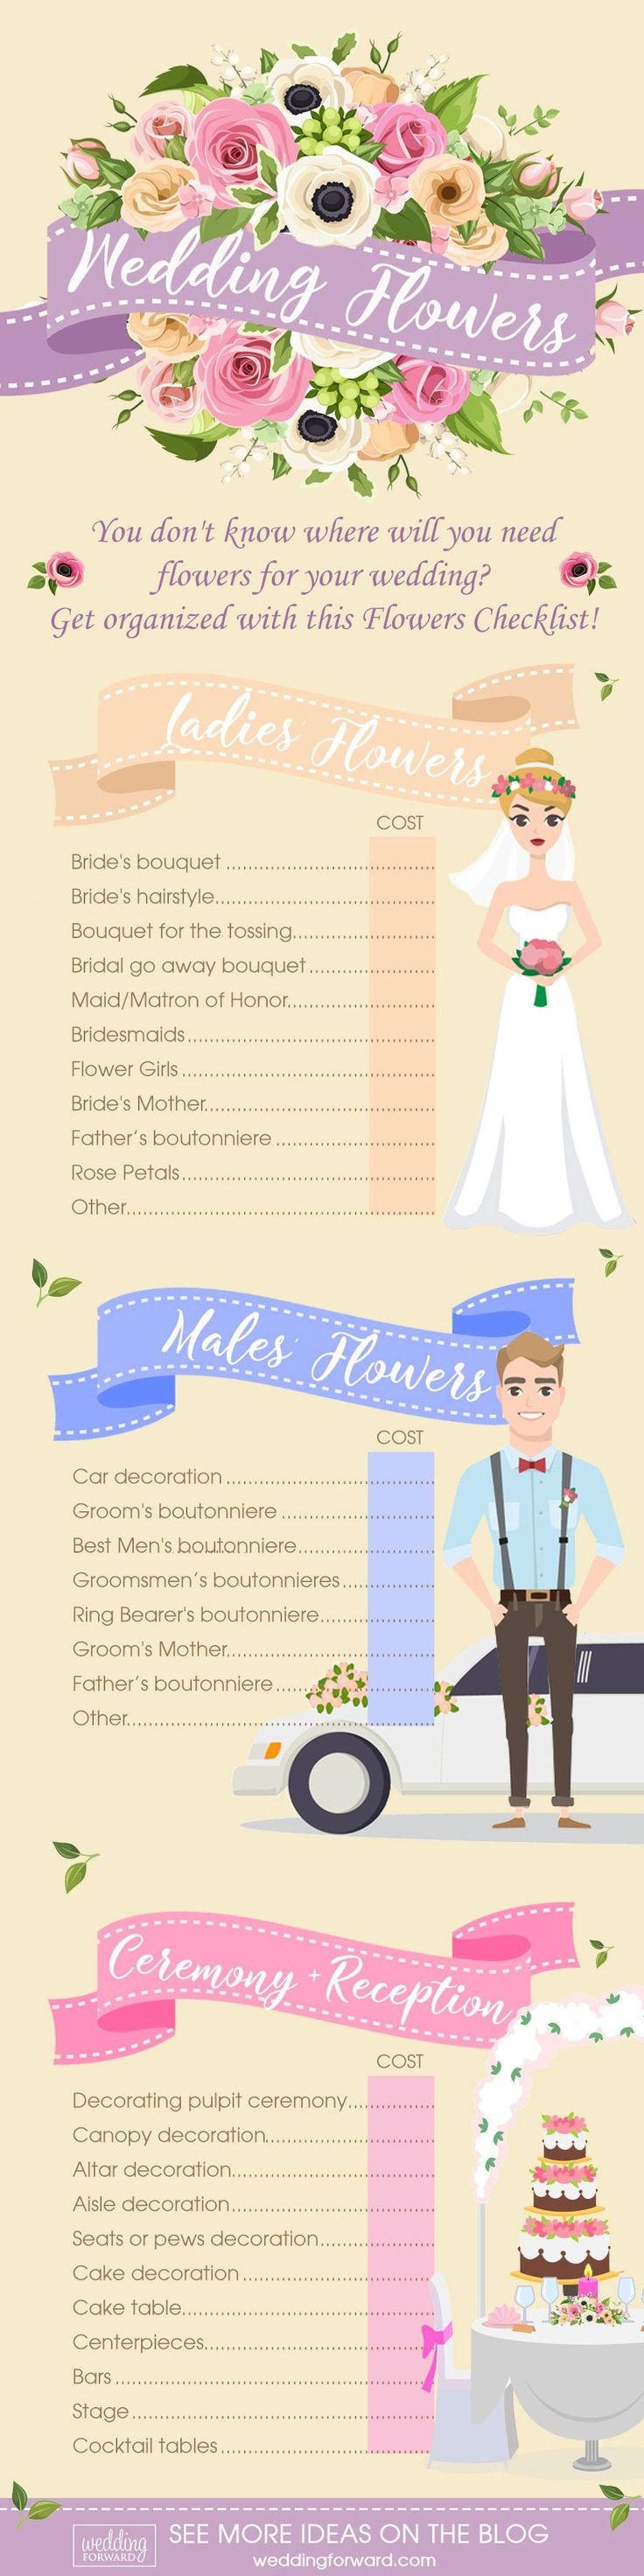 Wedding Flowers Infographics That Will Help You ❤ See more: http://www.weddingforward.com/wedding-flowers-infographics/ #weddingforward #bride #bridal #wedding #weddinginfographic